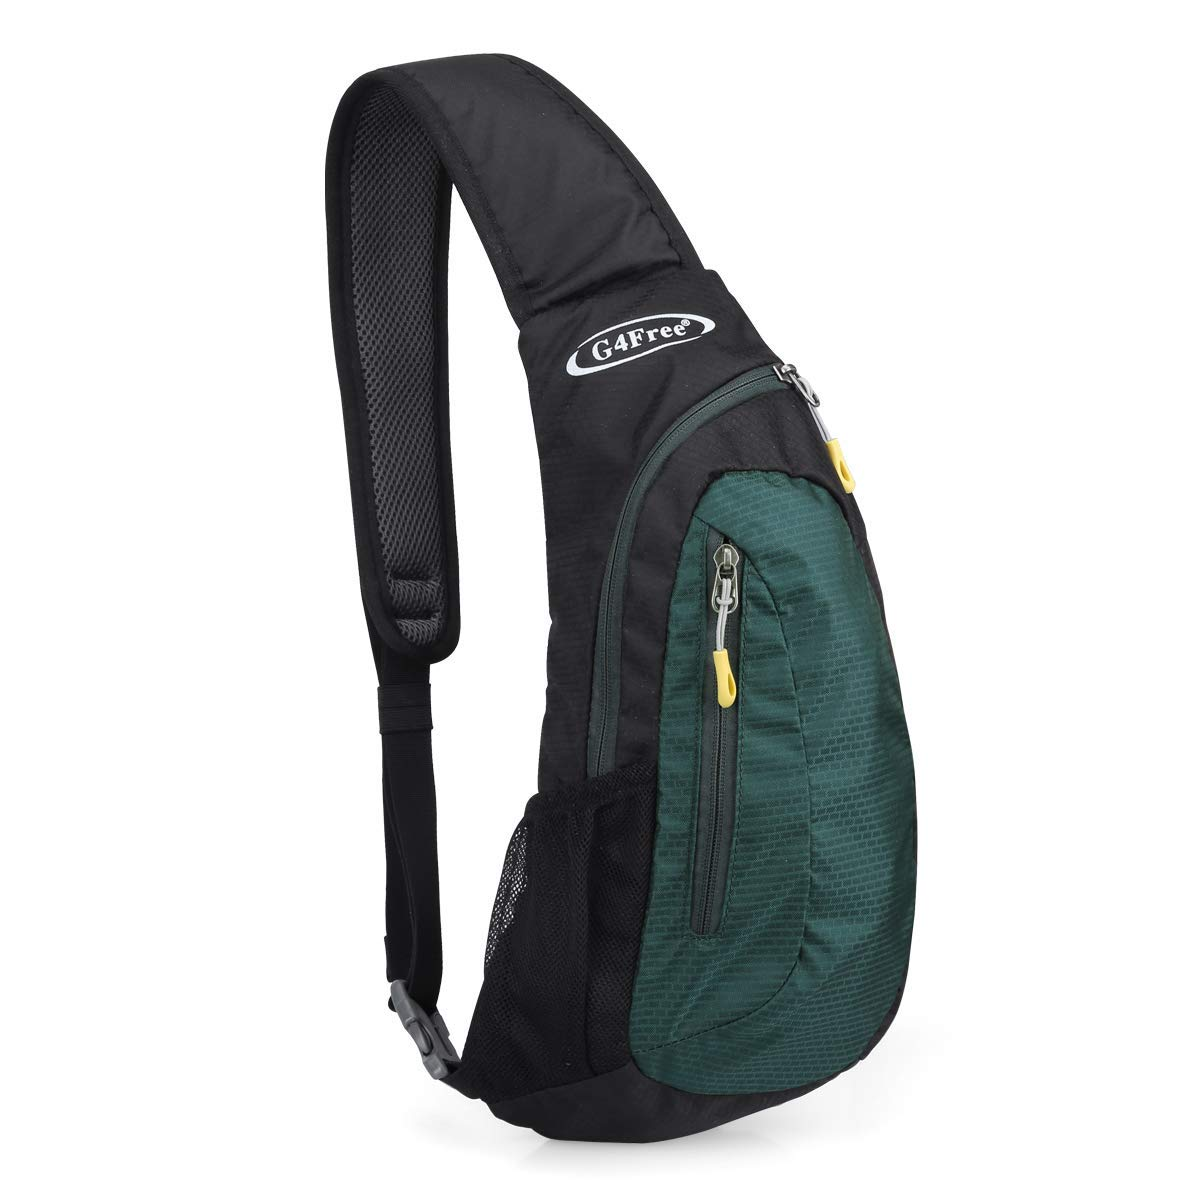 G4Free Sling Bags Men Shoulder Backpack Mini Chest Day Bag Small Cross Body Sling Backpack